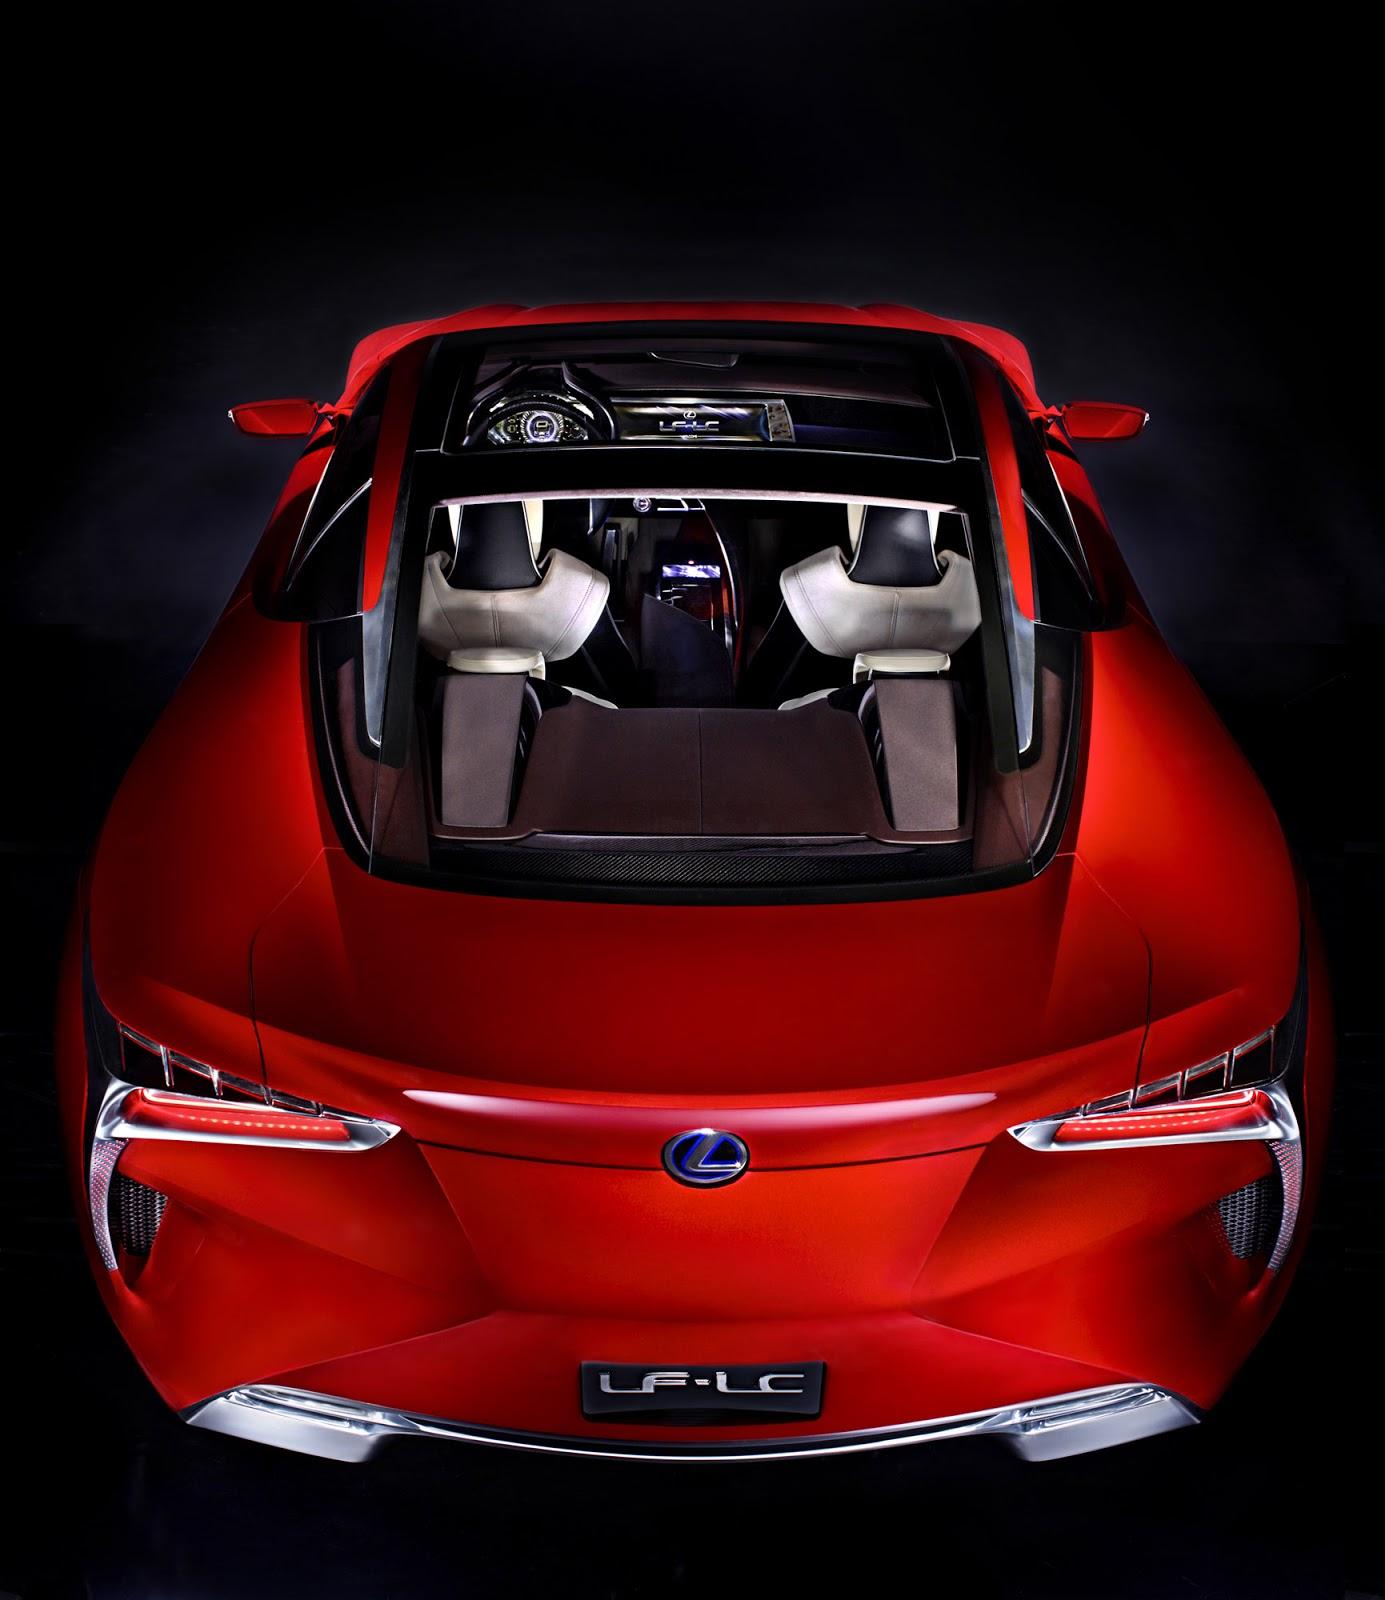 Cars GTO: 2012 Lexus LF-LC Sport Coupe Concept